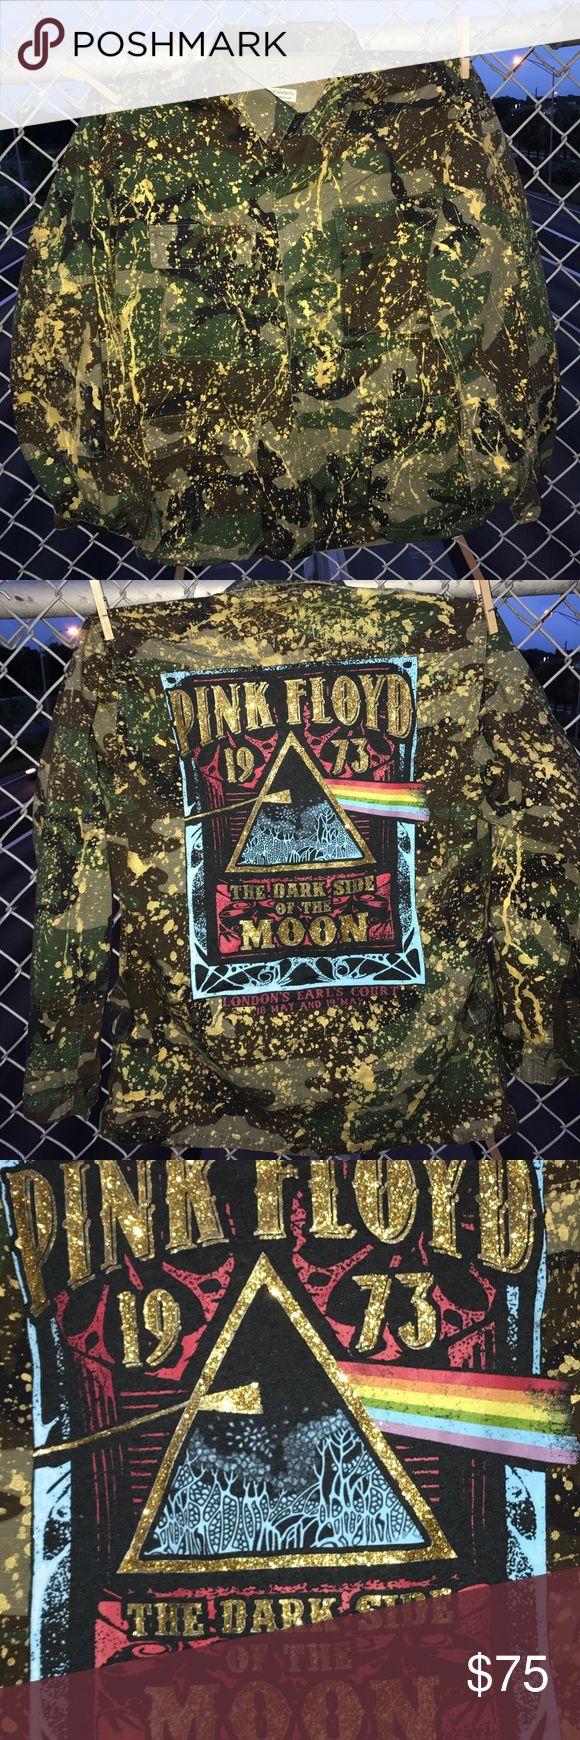 Custom Pink Floyd Army Fatigue Jacket Custom Paint Splattered And Pink Floyd T-Shirt Embellished  Fatigue Jacket. Size Small Or Oversize Small. One Of A Kind. Jackets & Coats